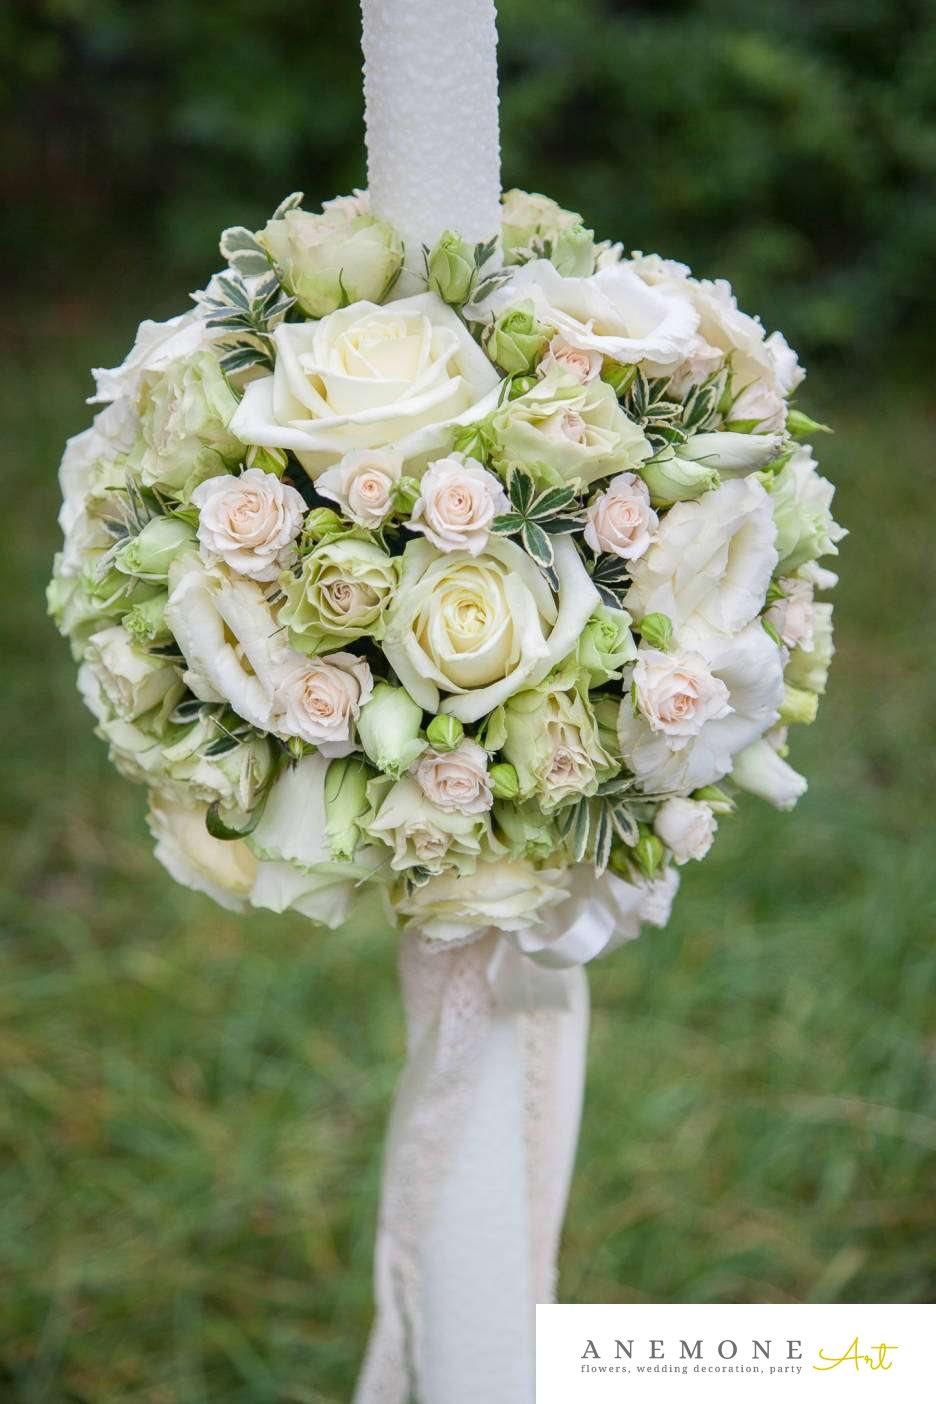 Poza, foto cu Flori de nunta alb, crem, dantela, lisianthus, lumanare cununie, mini-rosa, trandafiri in Arad, Timisoara, Oradea (wedding flowers, bouquets) nunta Arad, Timisoara, Oradea